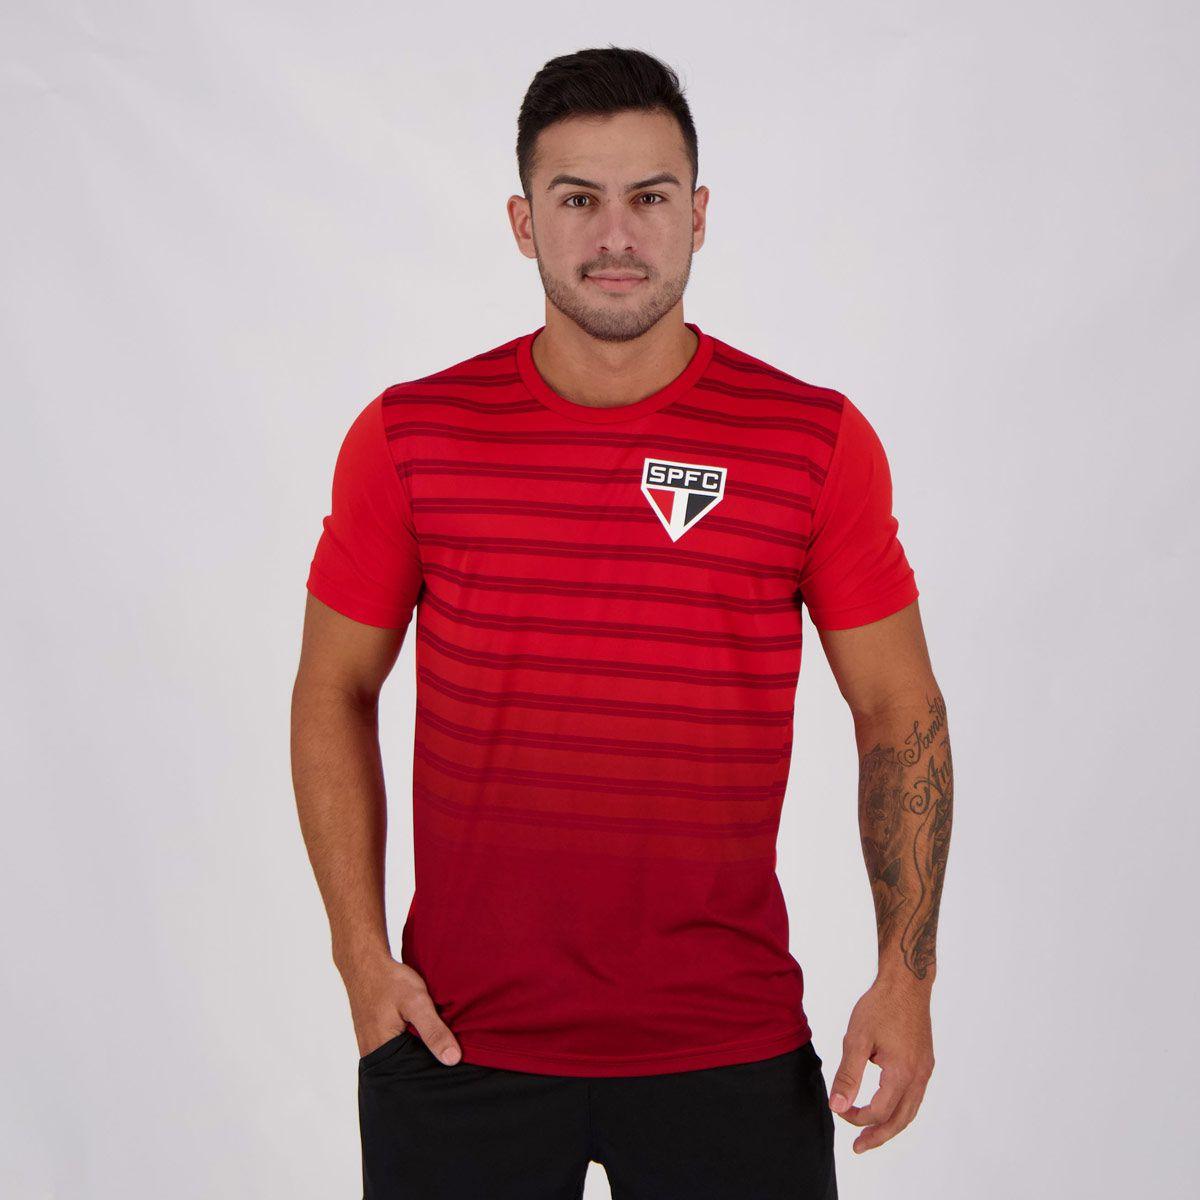 Camisa São Paulo Vermelha Croma SPR - Masculino